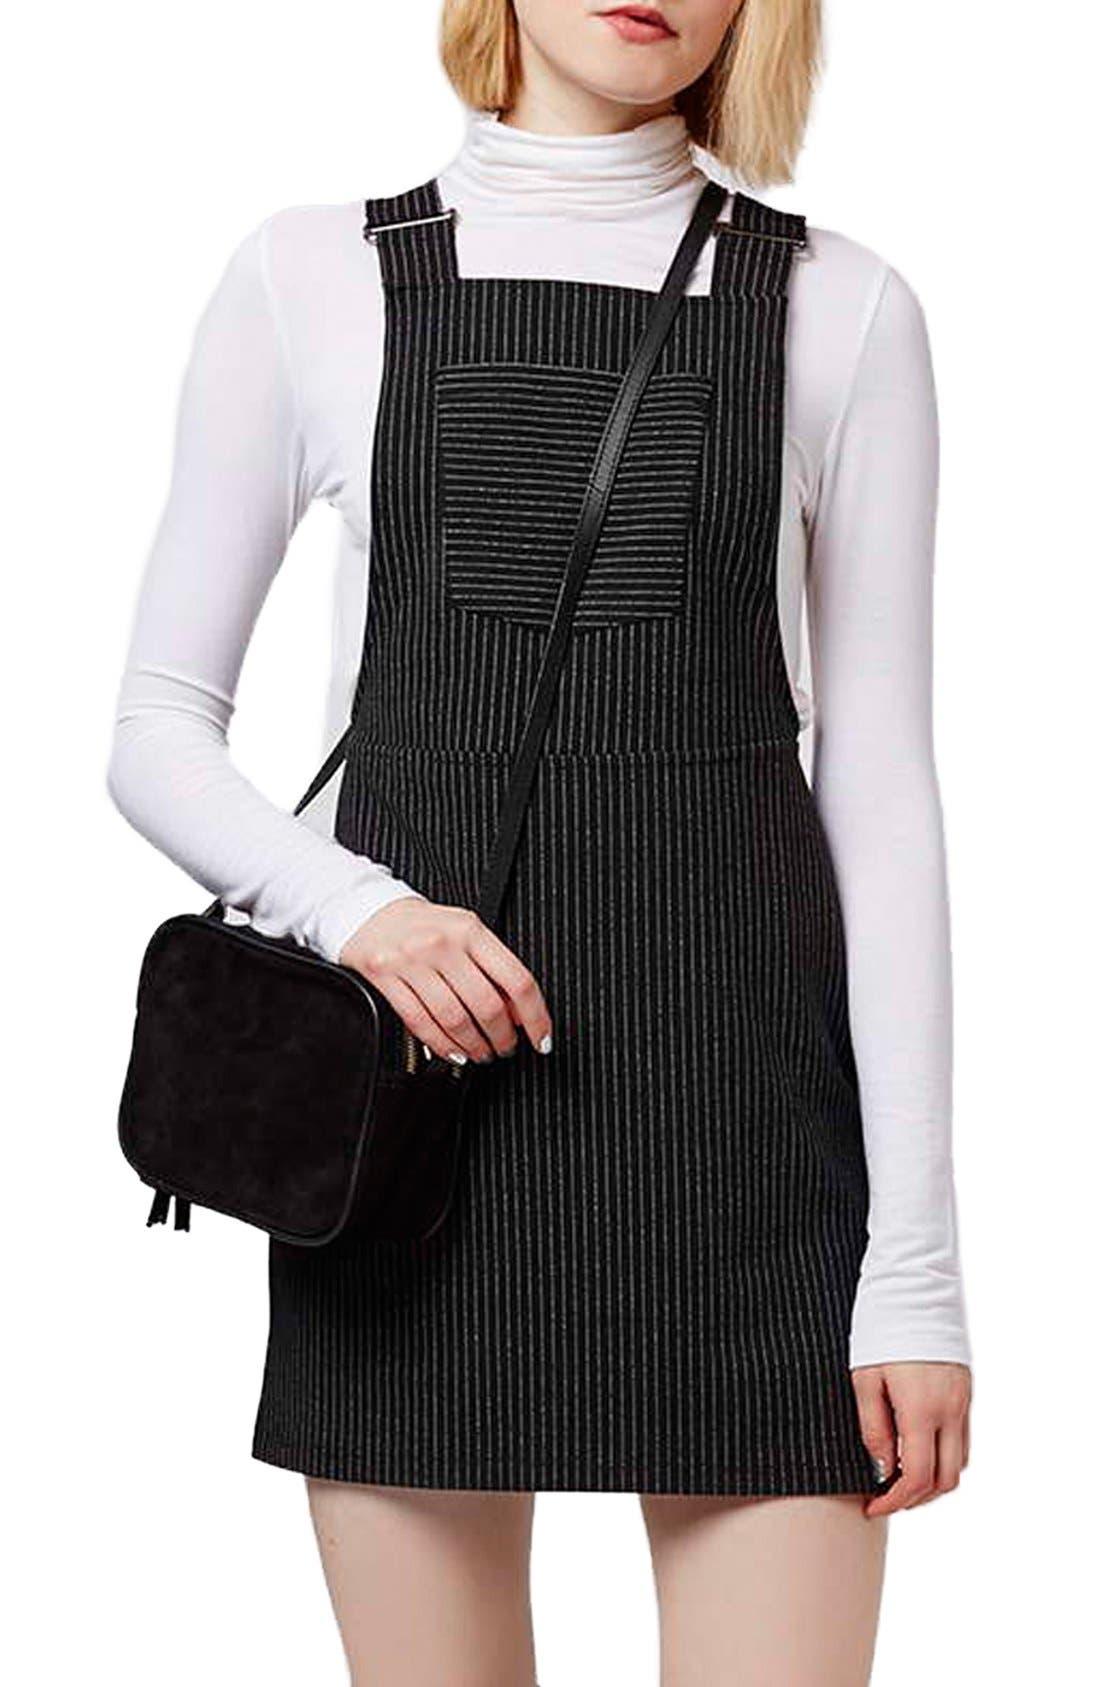 Alternate Image 1 Selected - Topshop Pinstripe Pinafore Dress